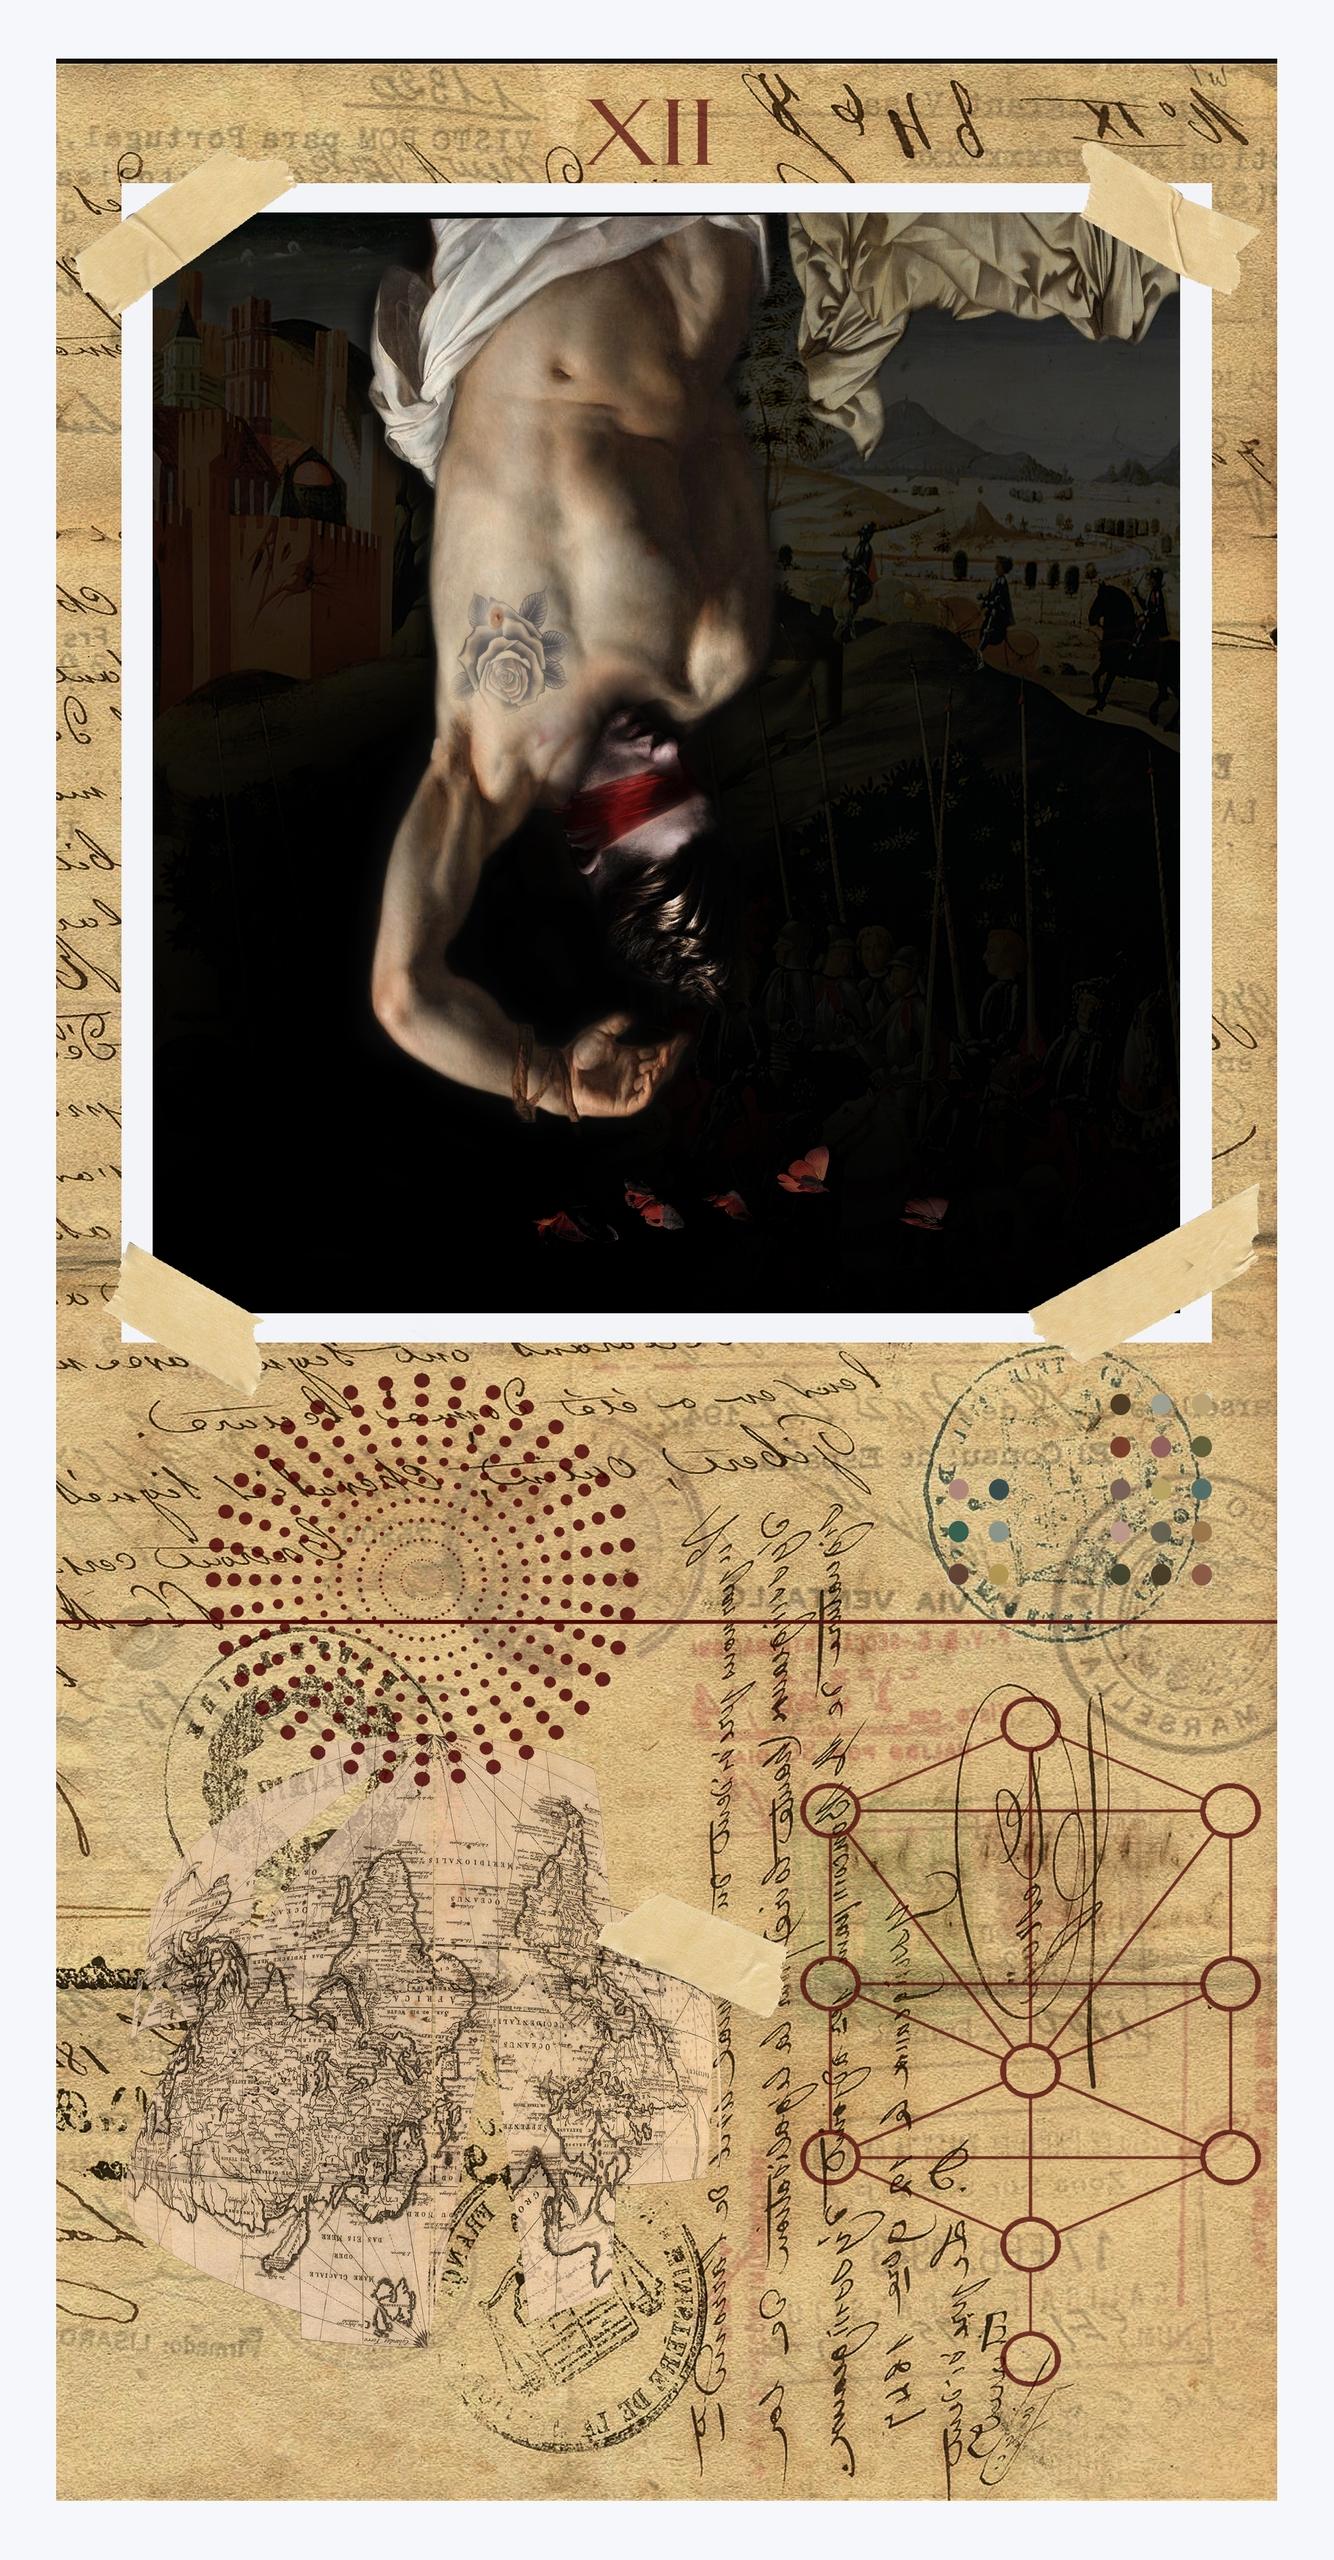 Hanged Man - heretical world vi - astroturf | ello